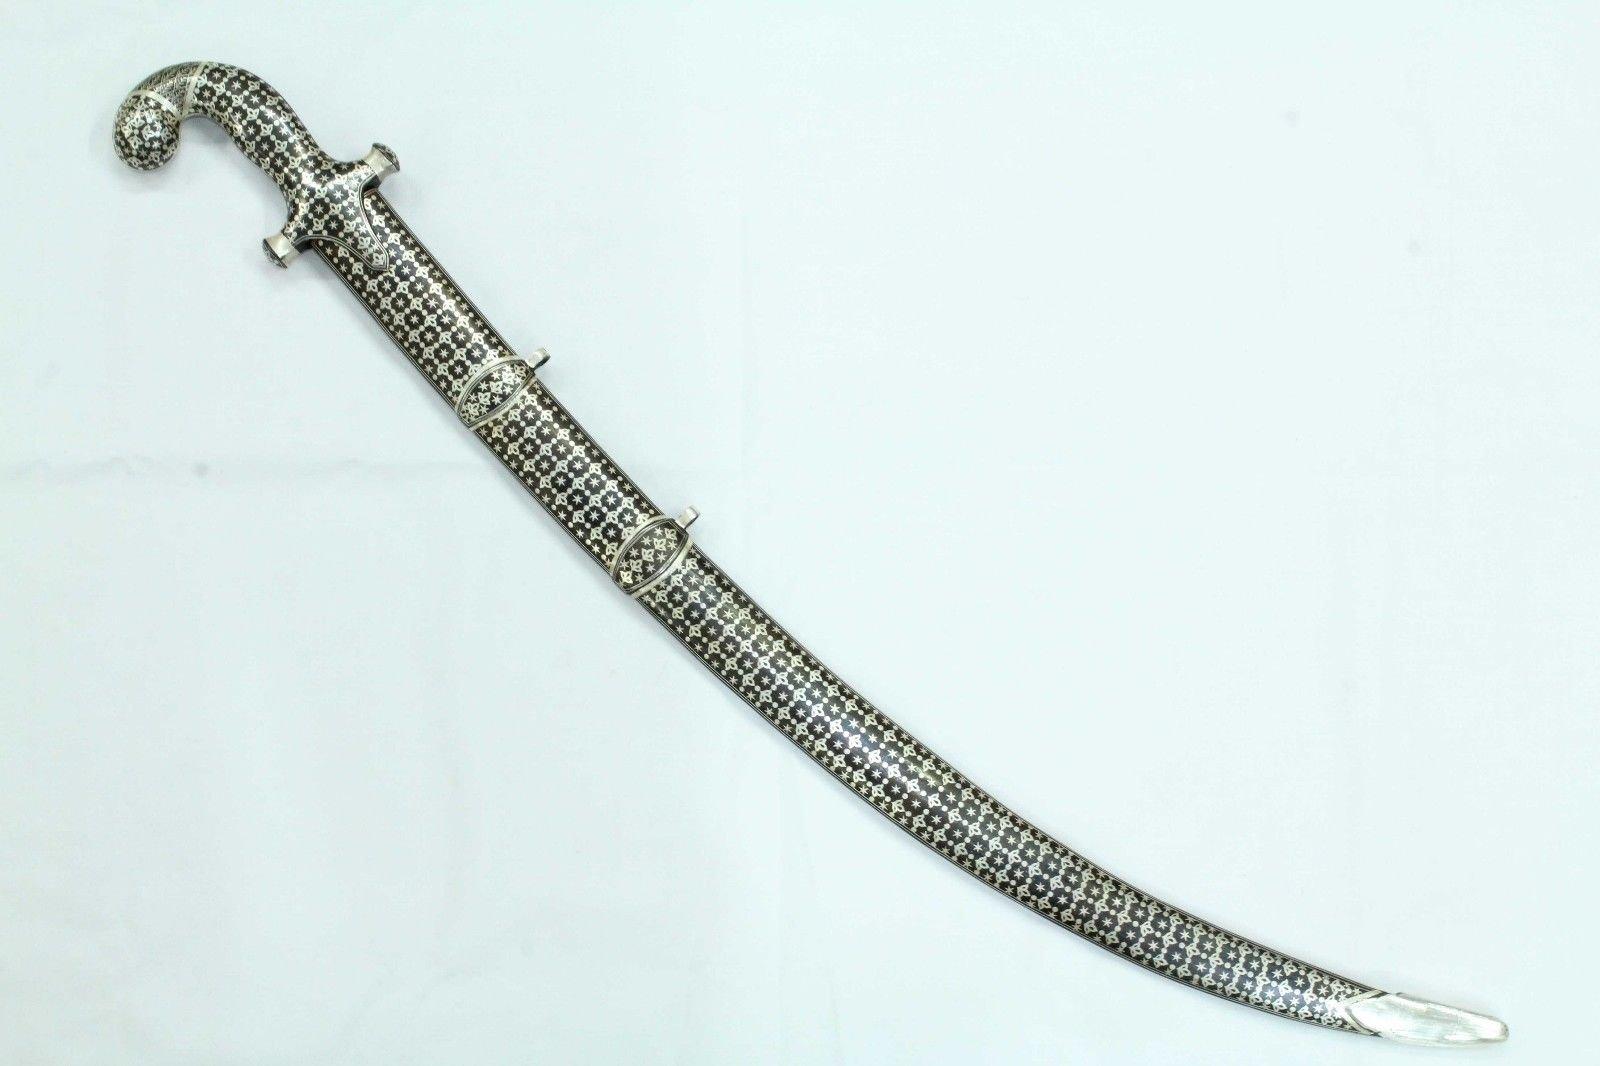 Rajasthan Gems SWORD DAMASCUS STEEL blade SILVER WIRE Bidaree work Handle sheath 32 inch